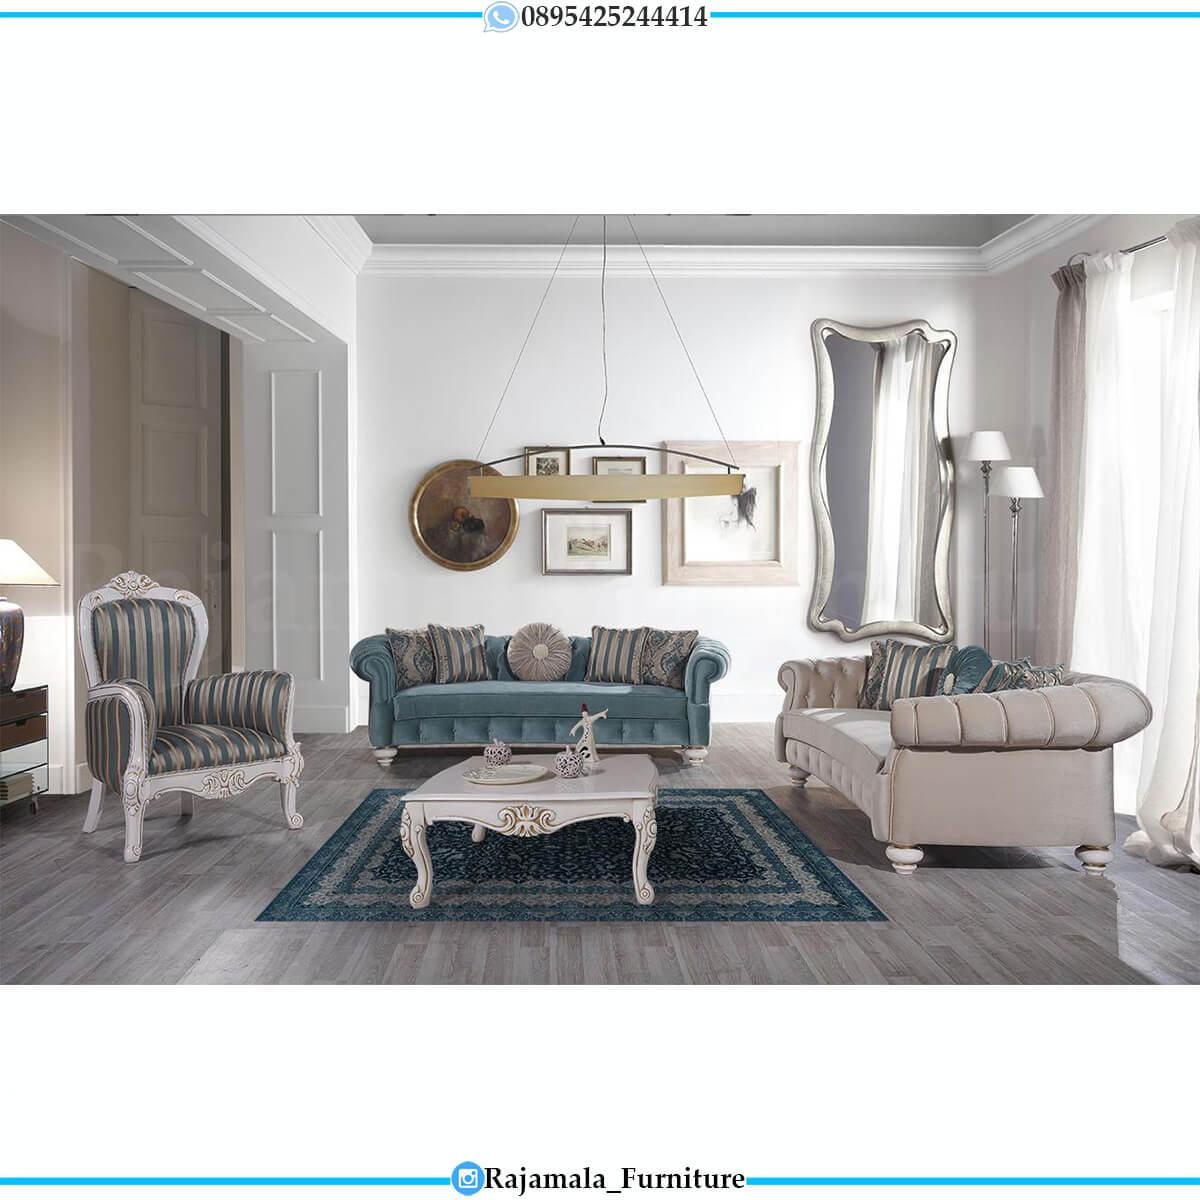 Sofa Tamu Minimalis Putih Duco Luxury Design Best Quality RM-0618